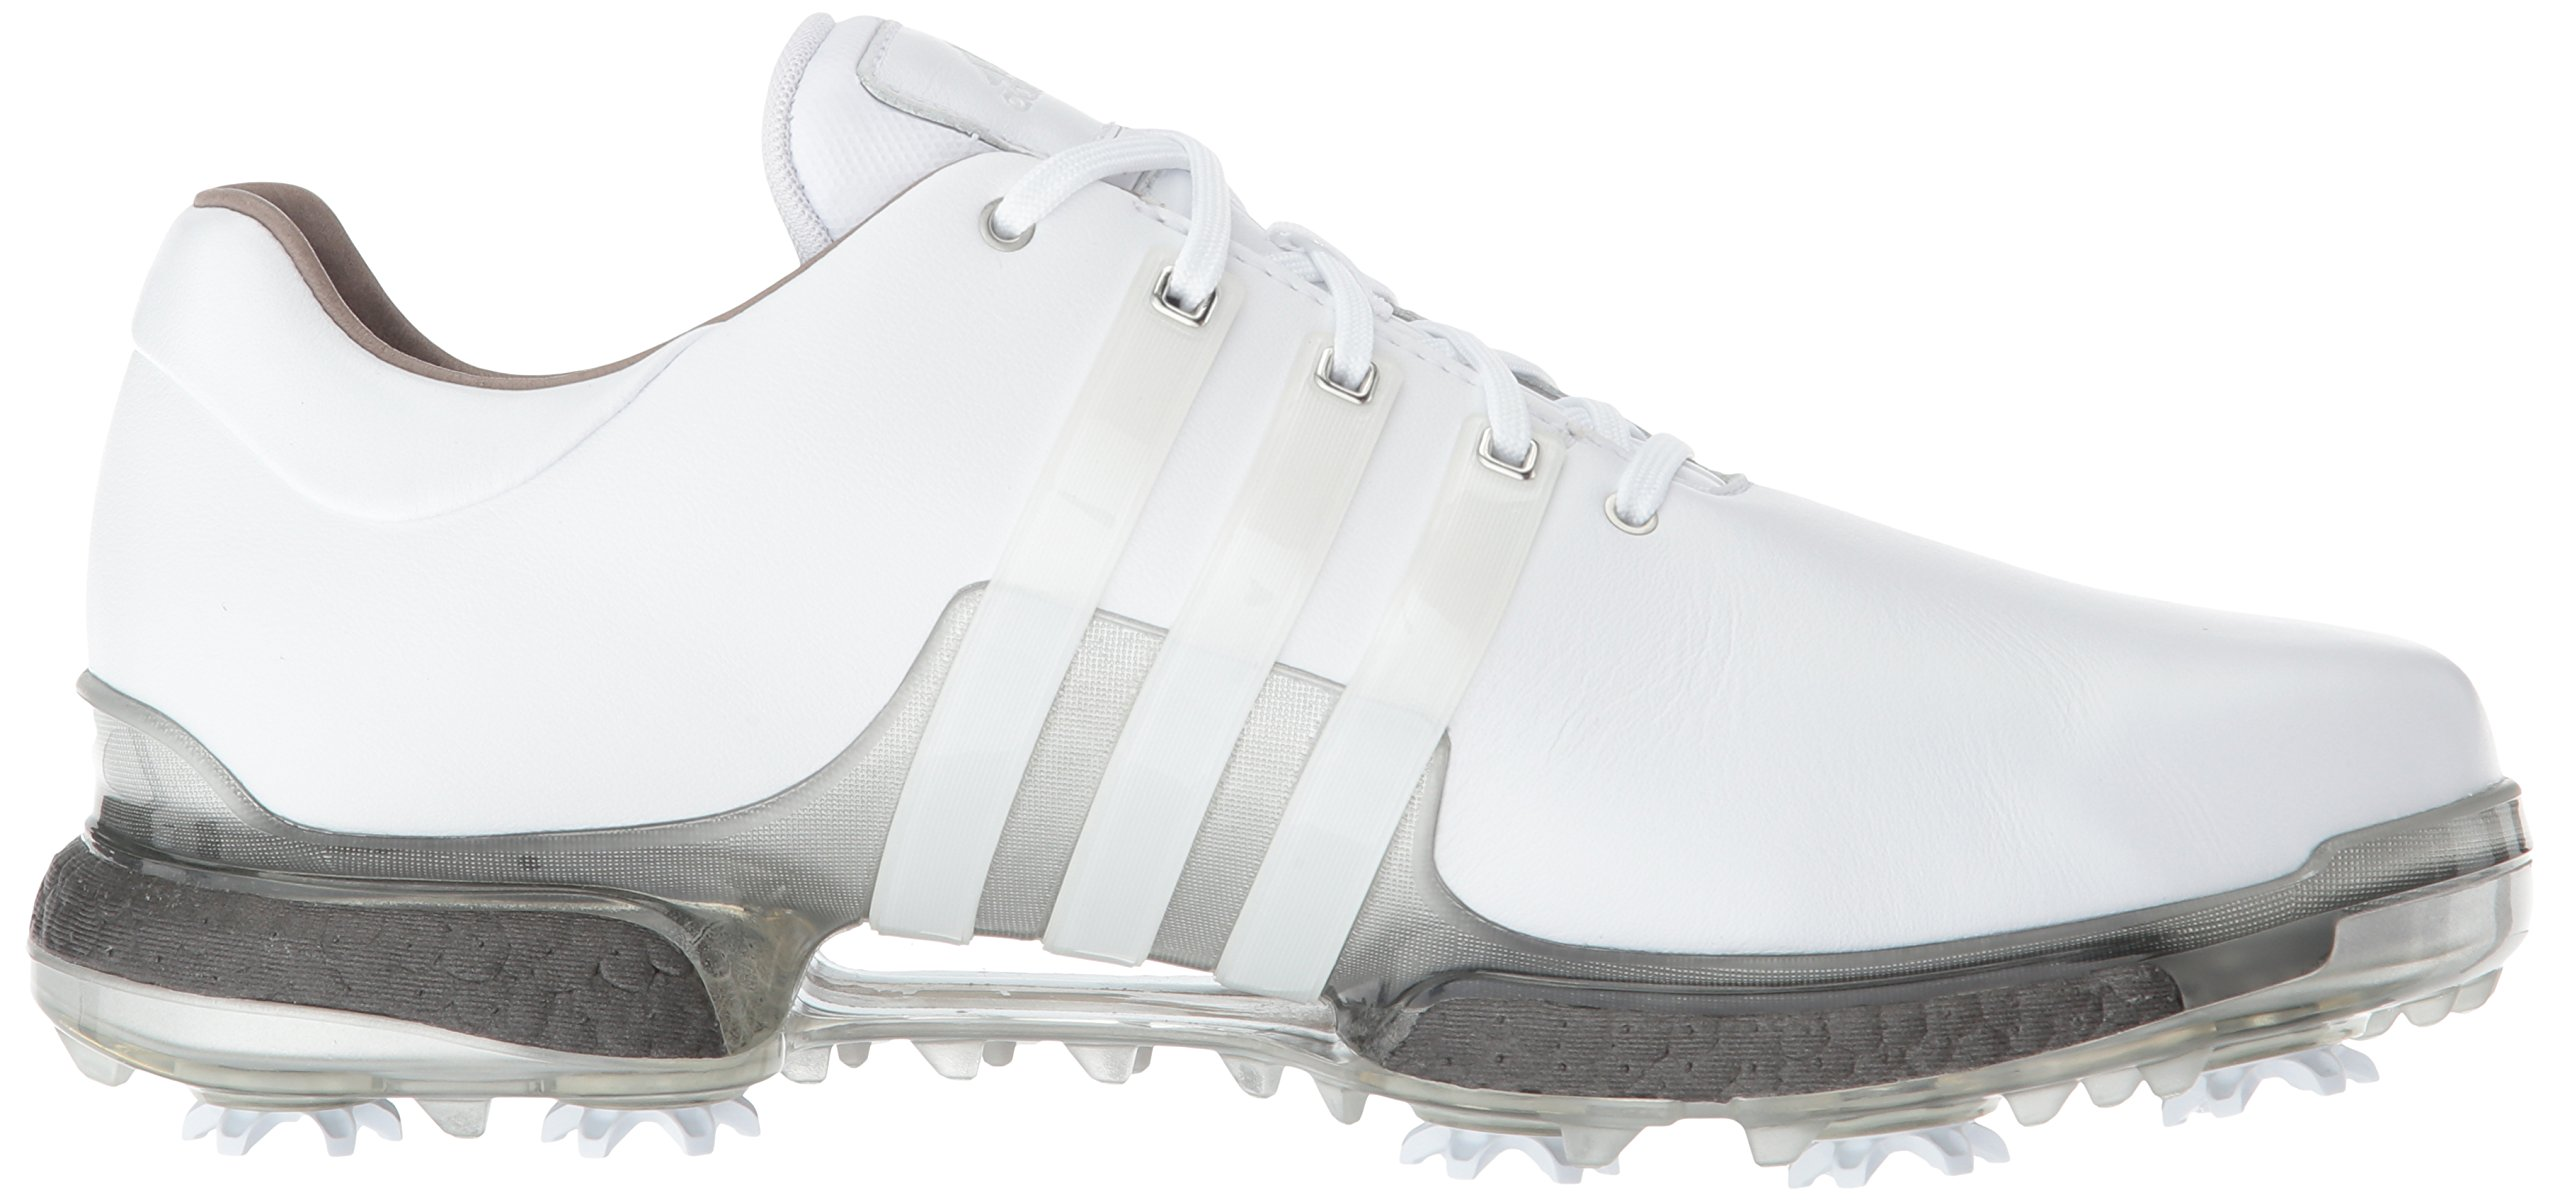 adidas mens tour 360 boost 2.0 golf shoes